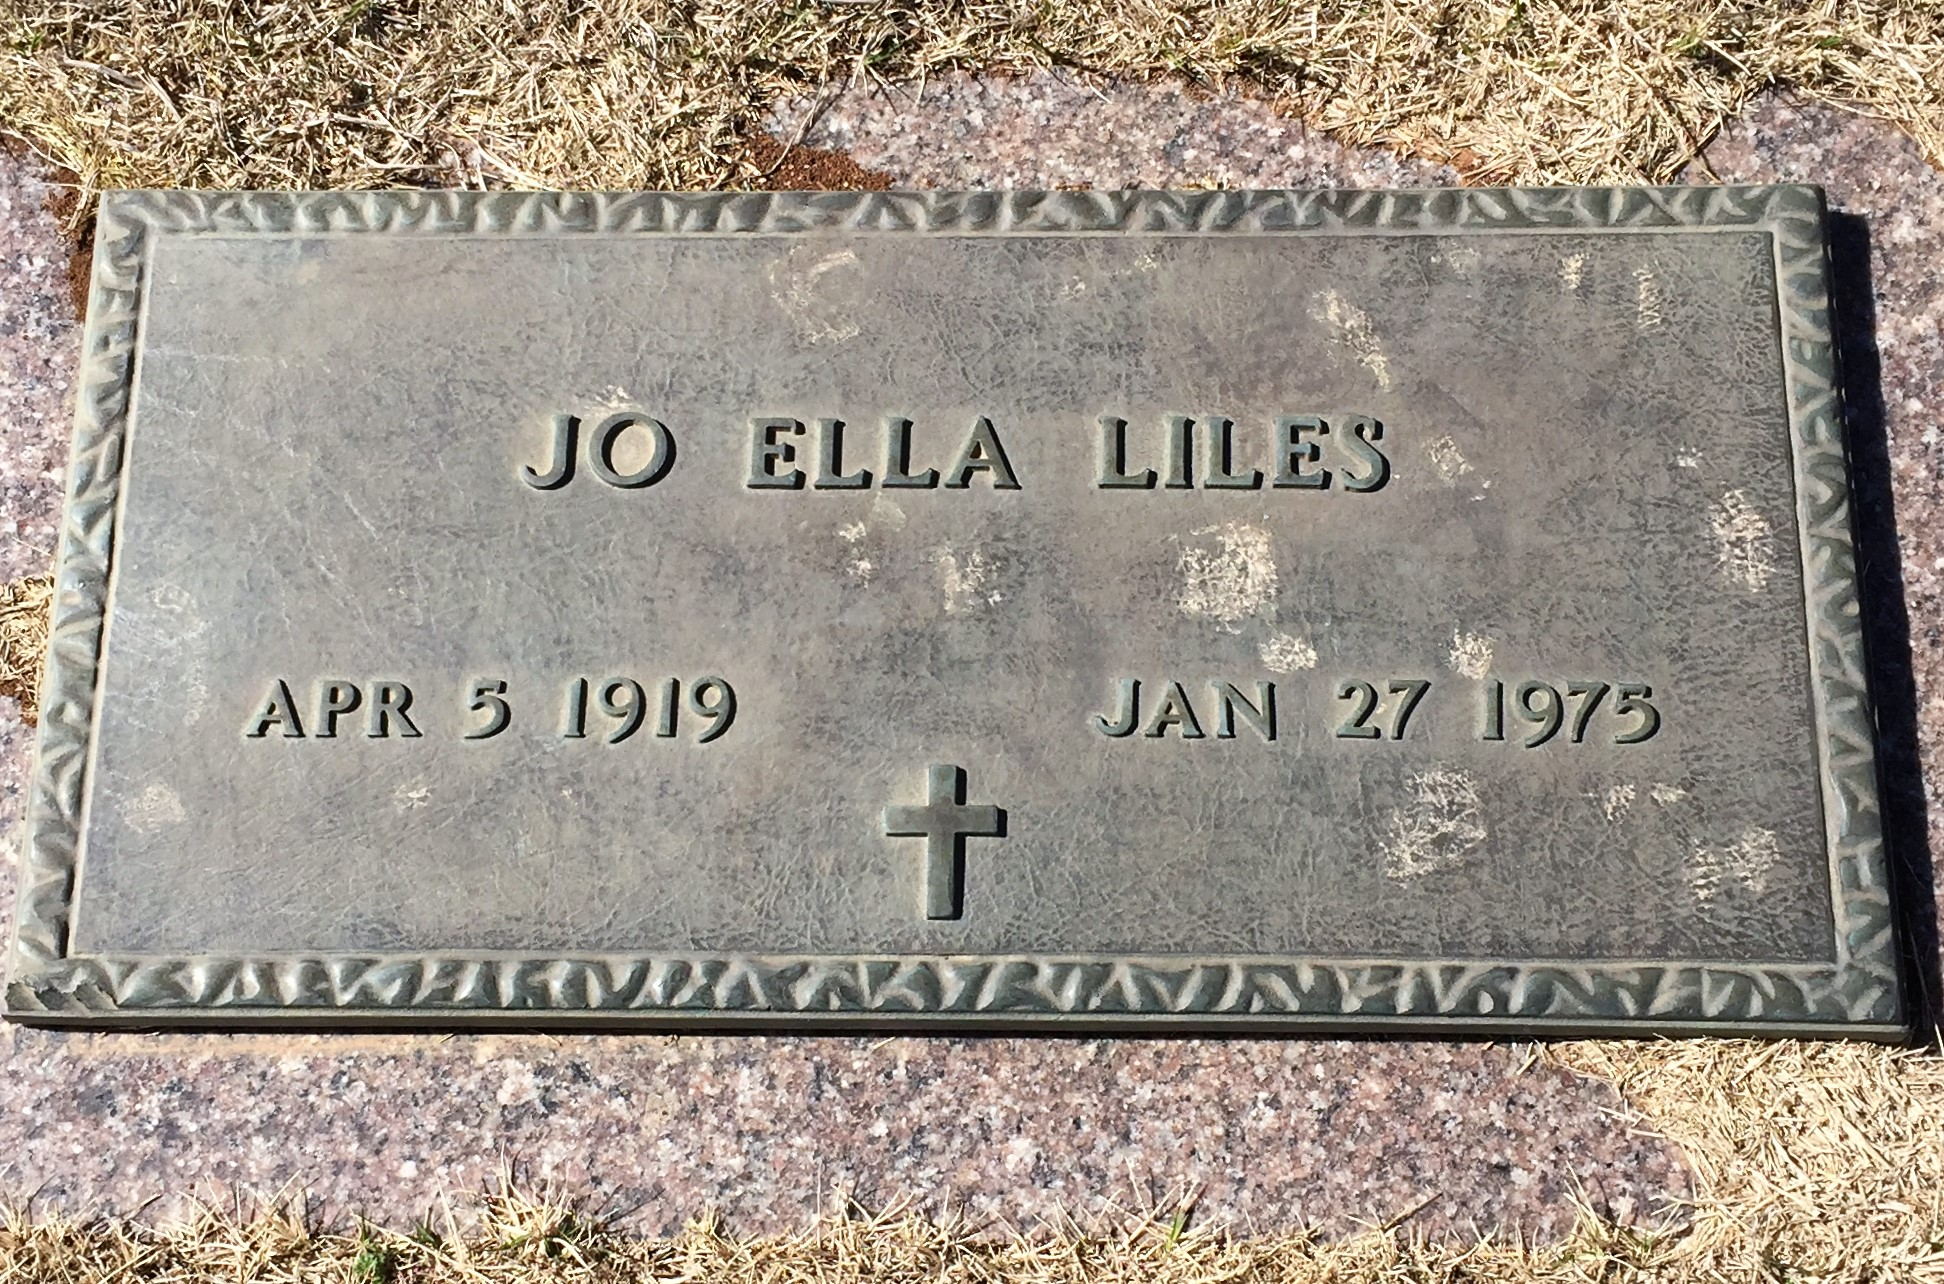 Jo Ella Liles' grave in Oklahoma